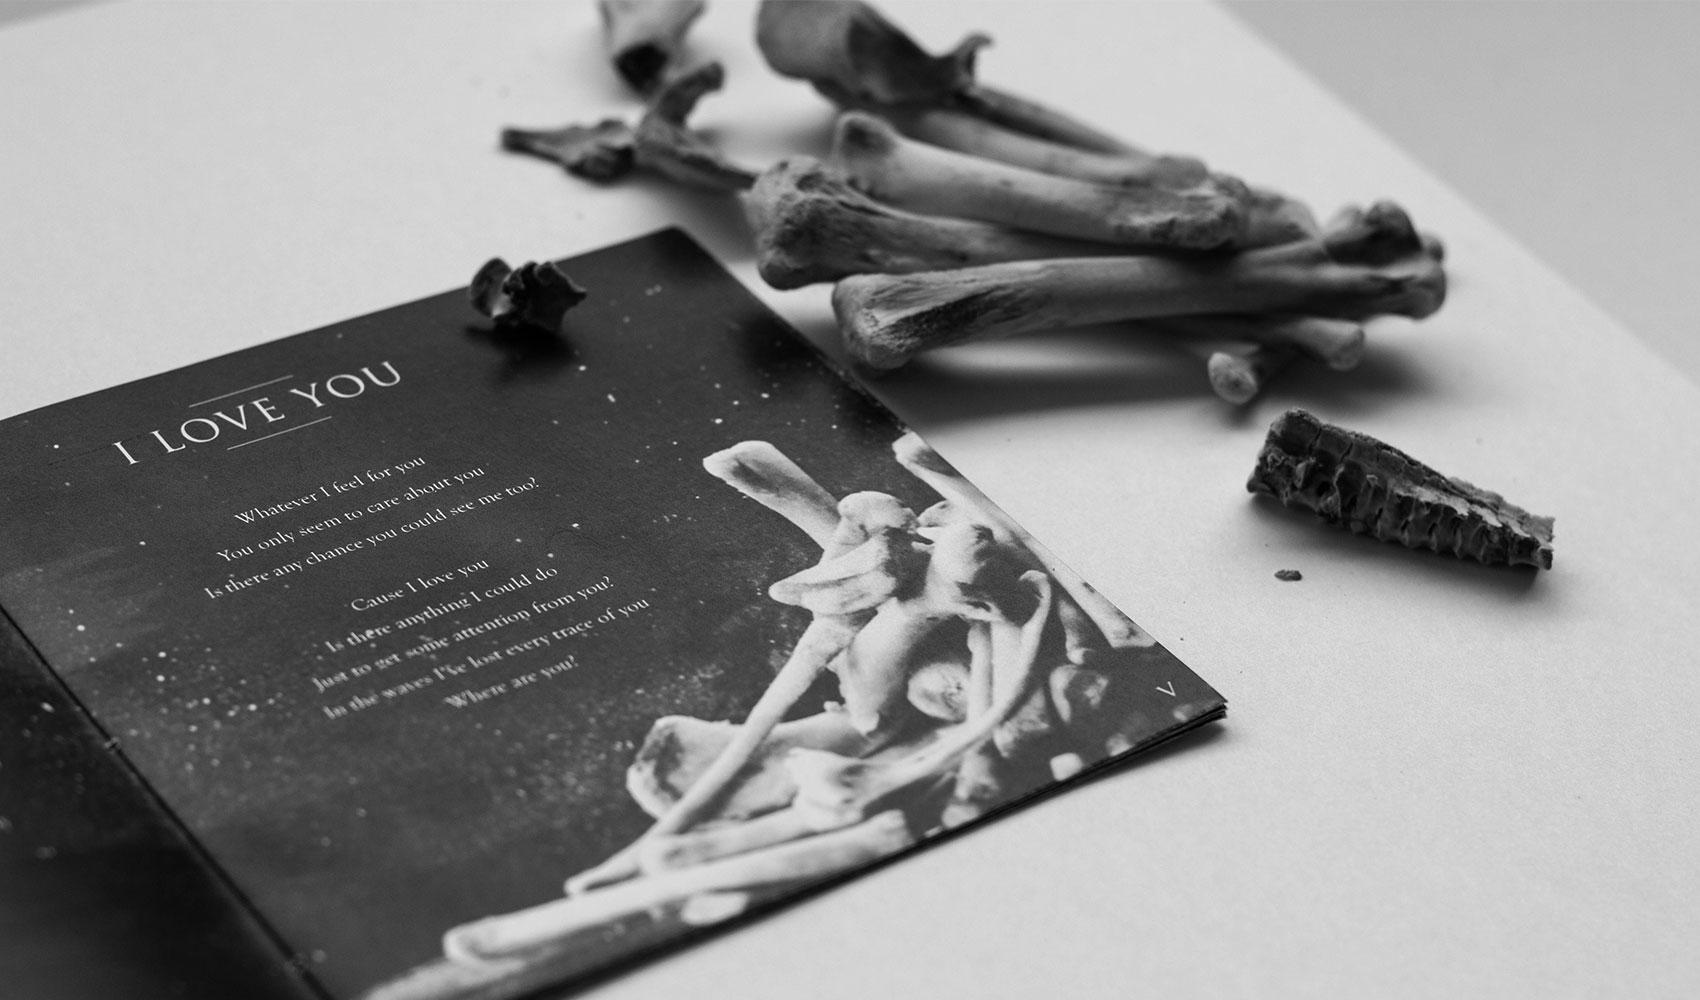 Woodkid Redesign Album - Personal Work: Booklet Knochen